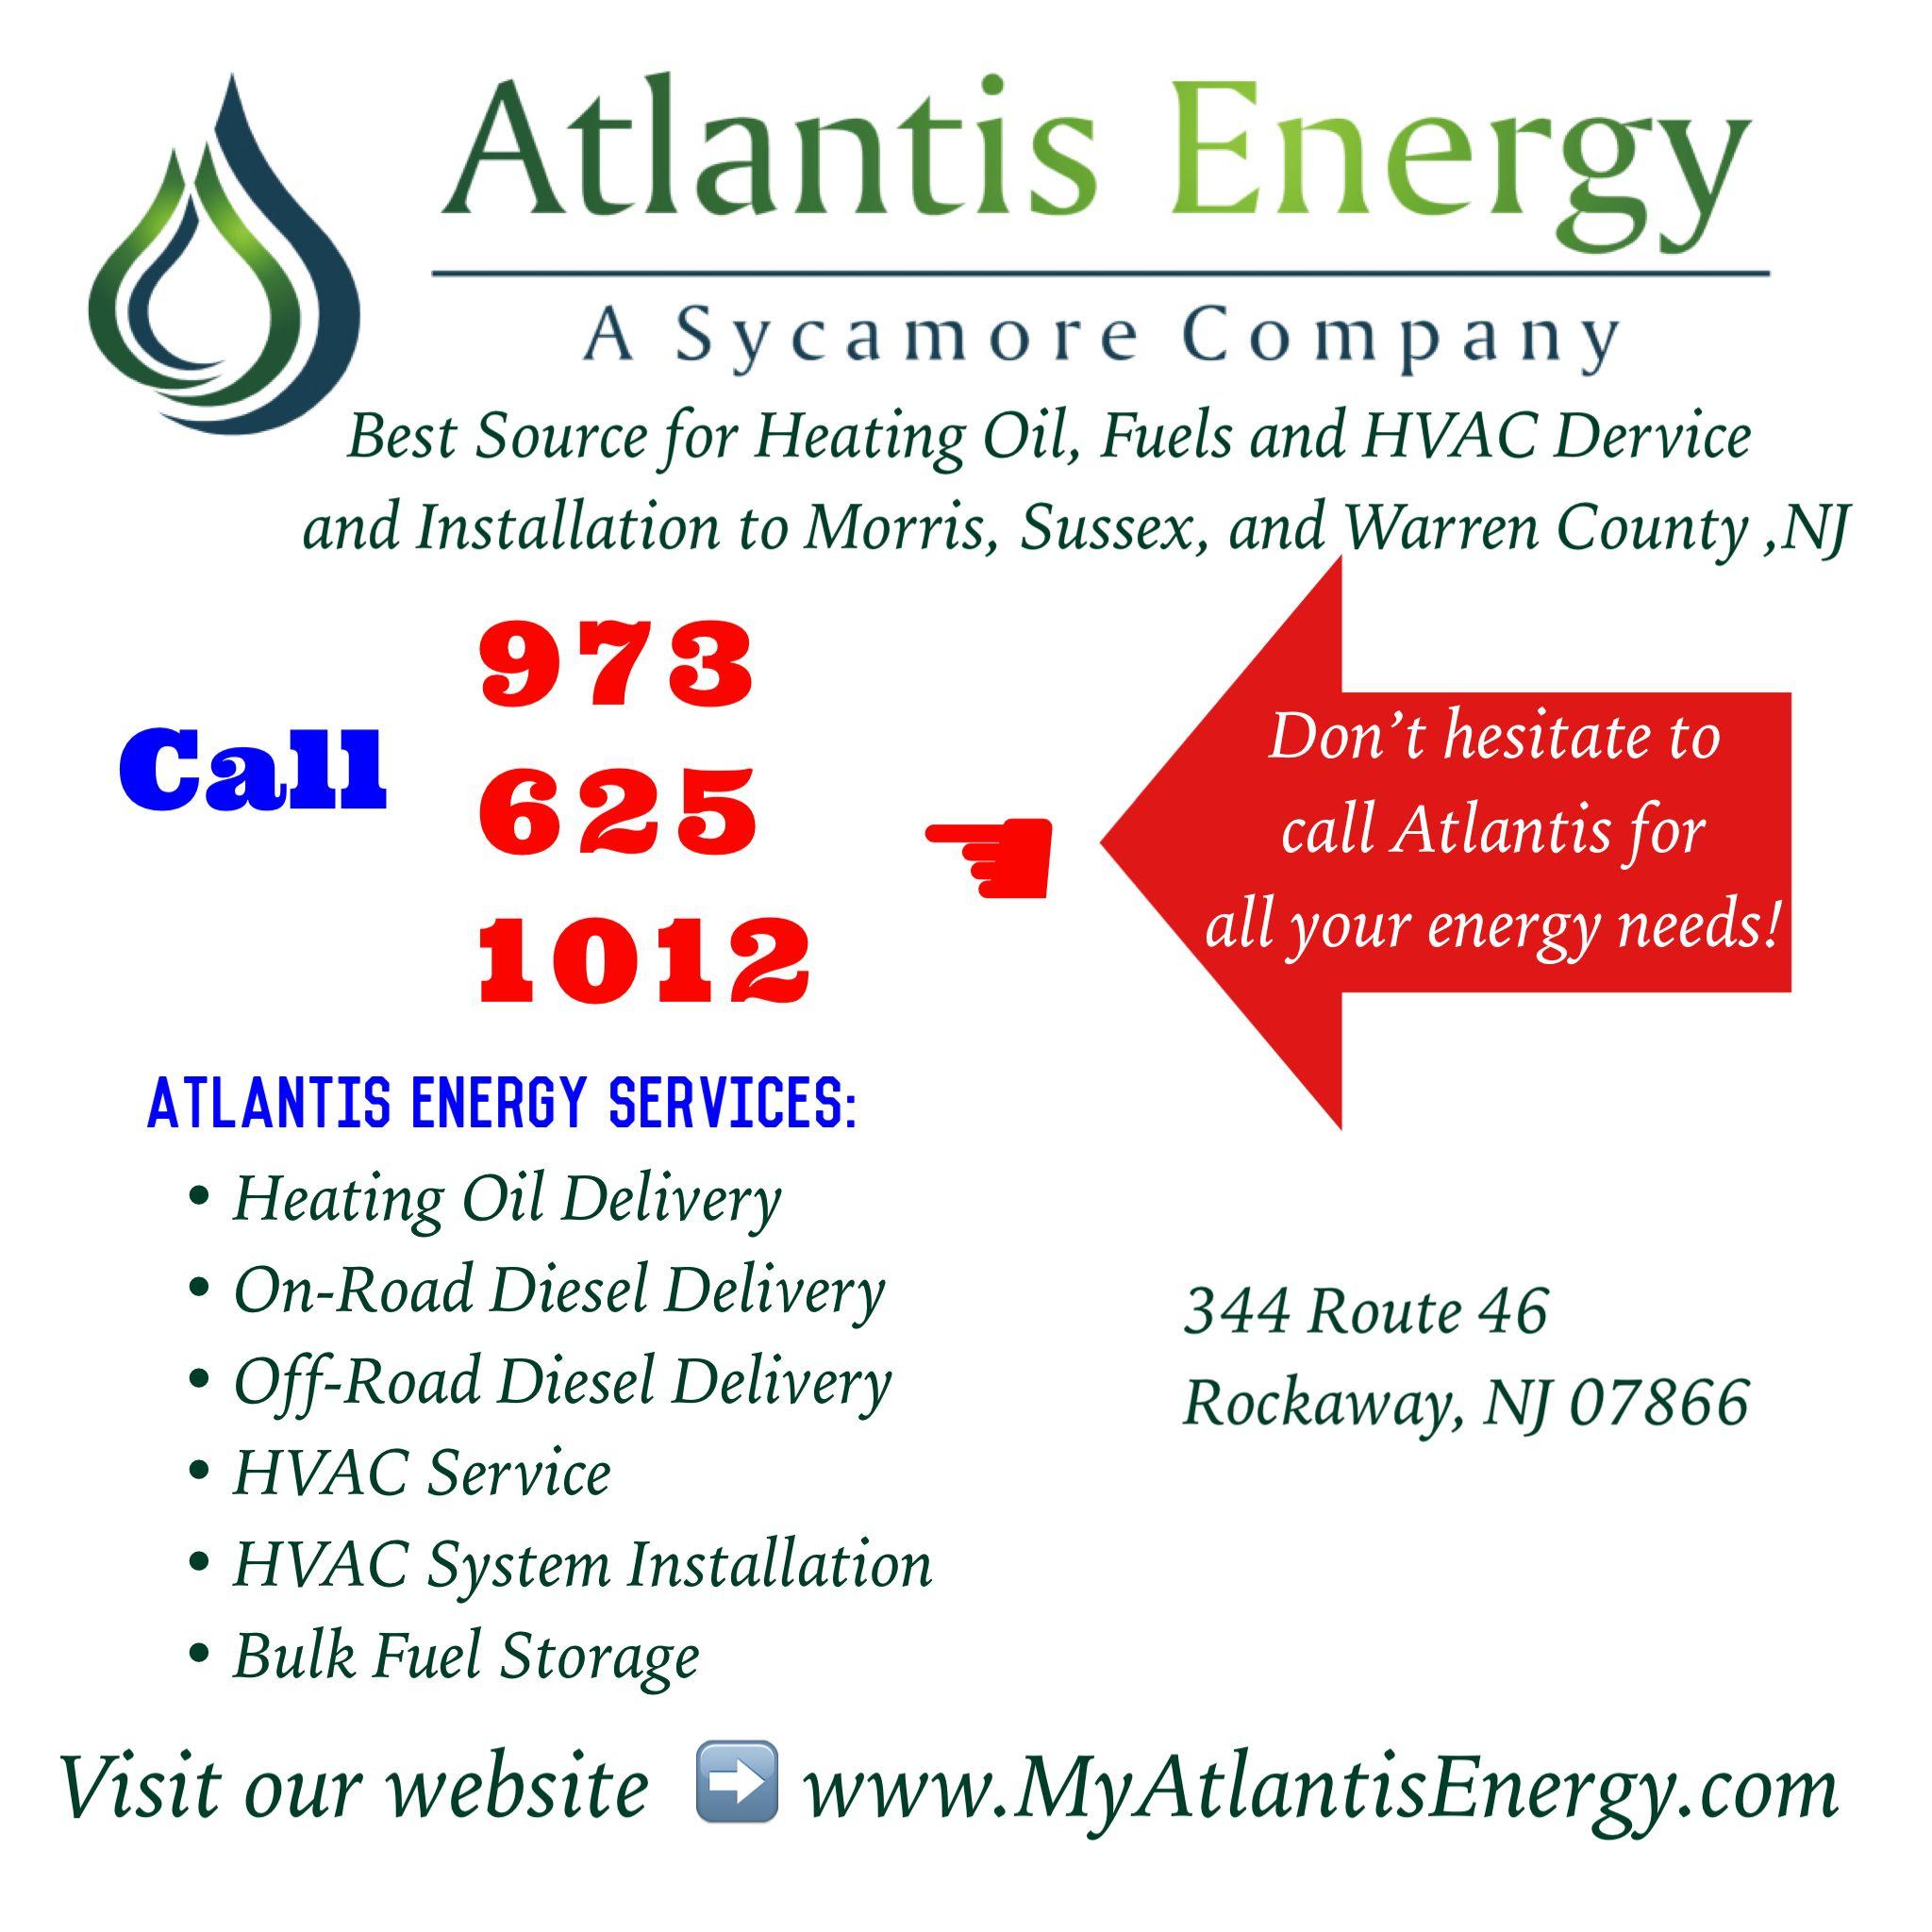 Superior Heating Oil · ☎ 973 625 1012 ☎ ▫ ◾ ◼ 344